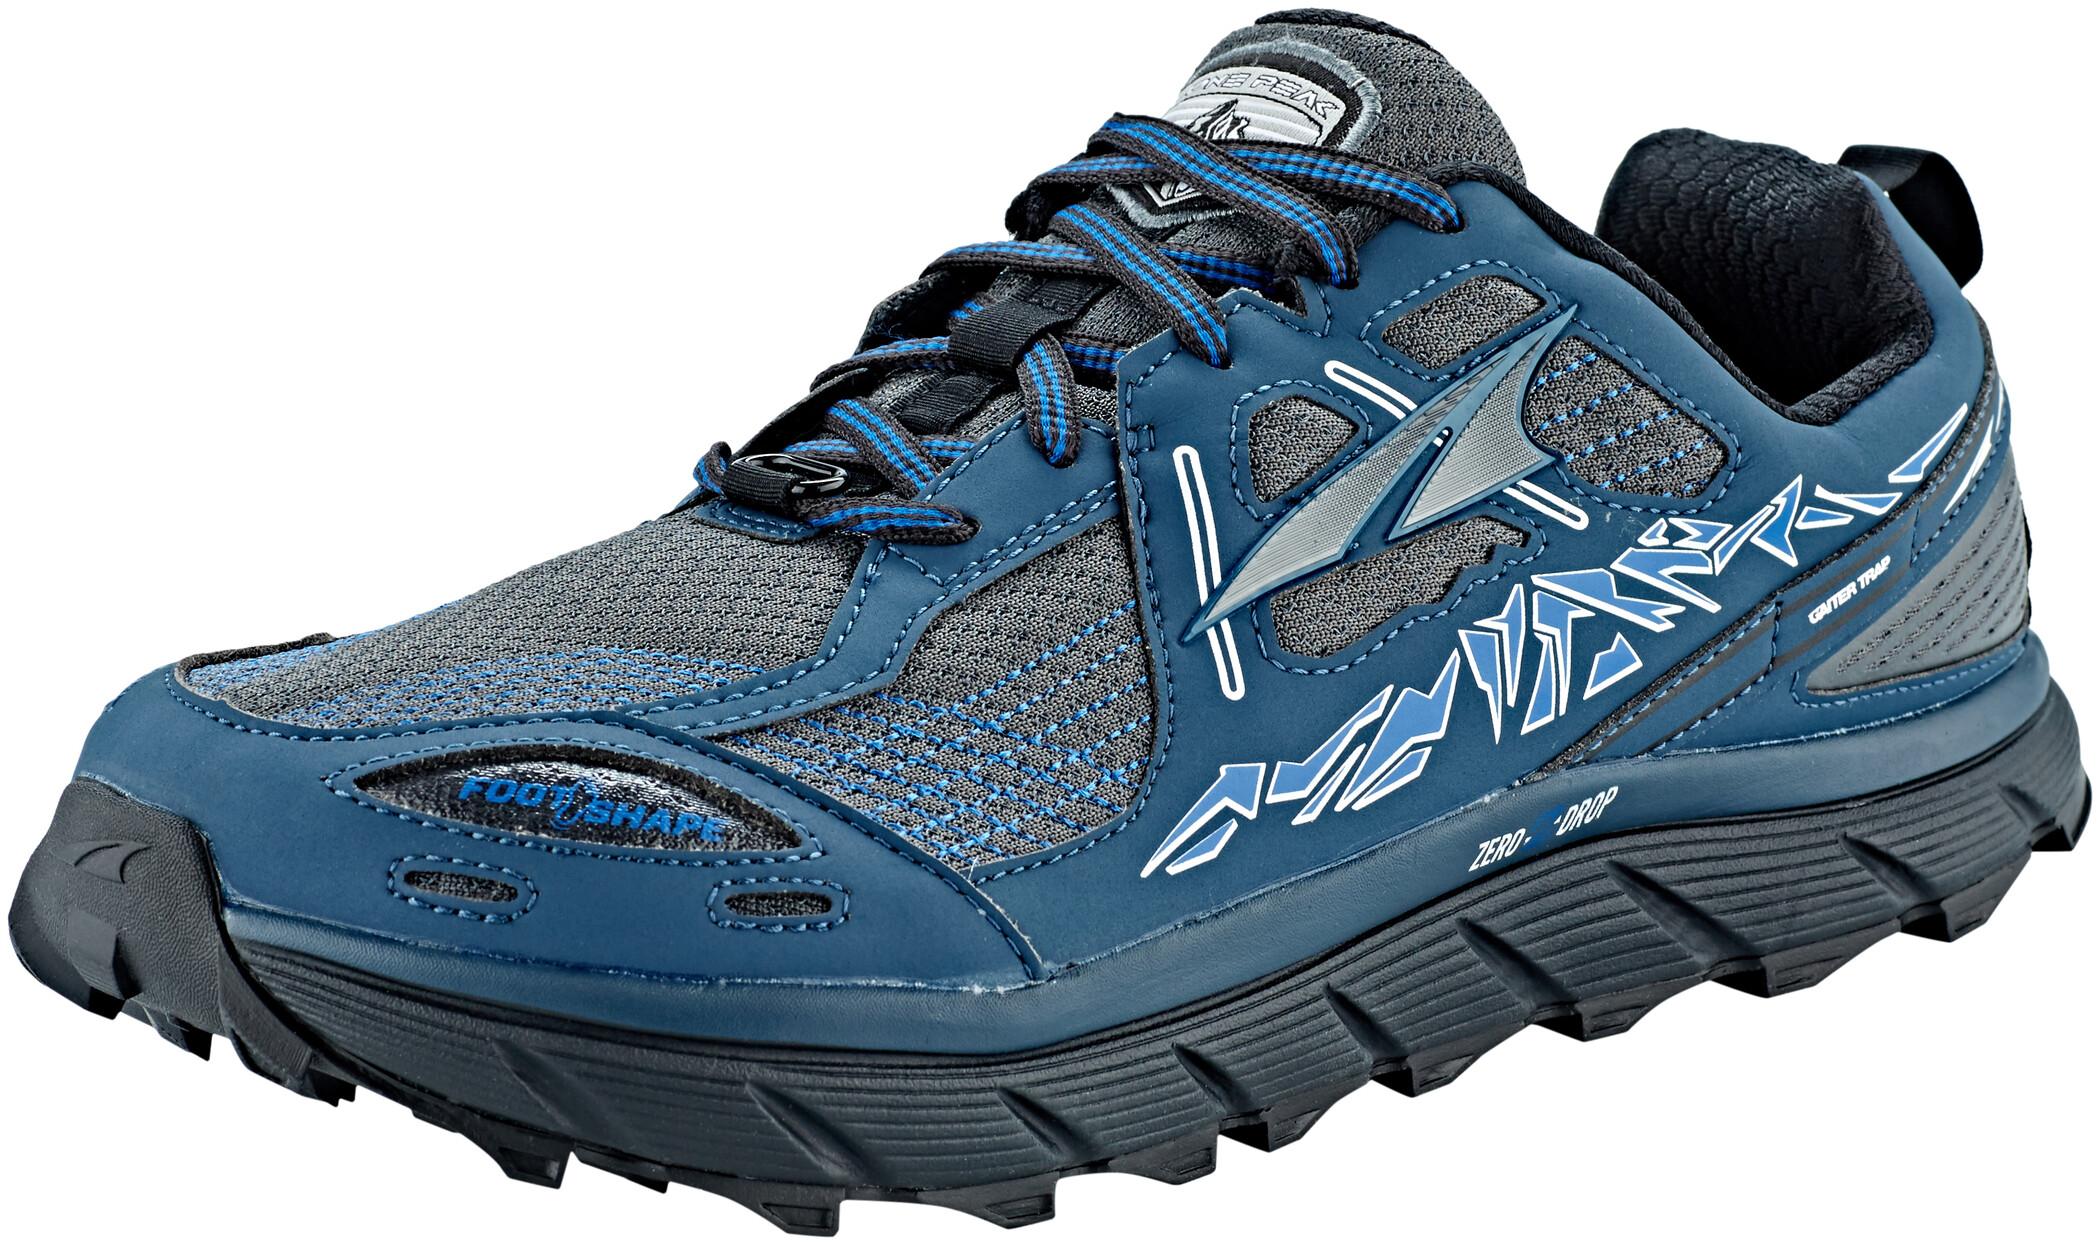 Altra Lone Peak 3.5 Sko Herrer, blue   Shoes and overlays